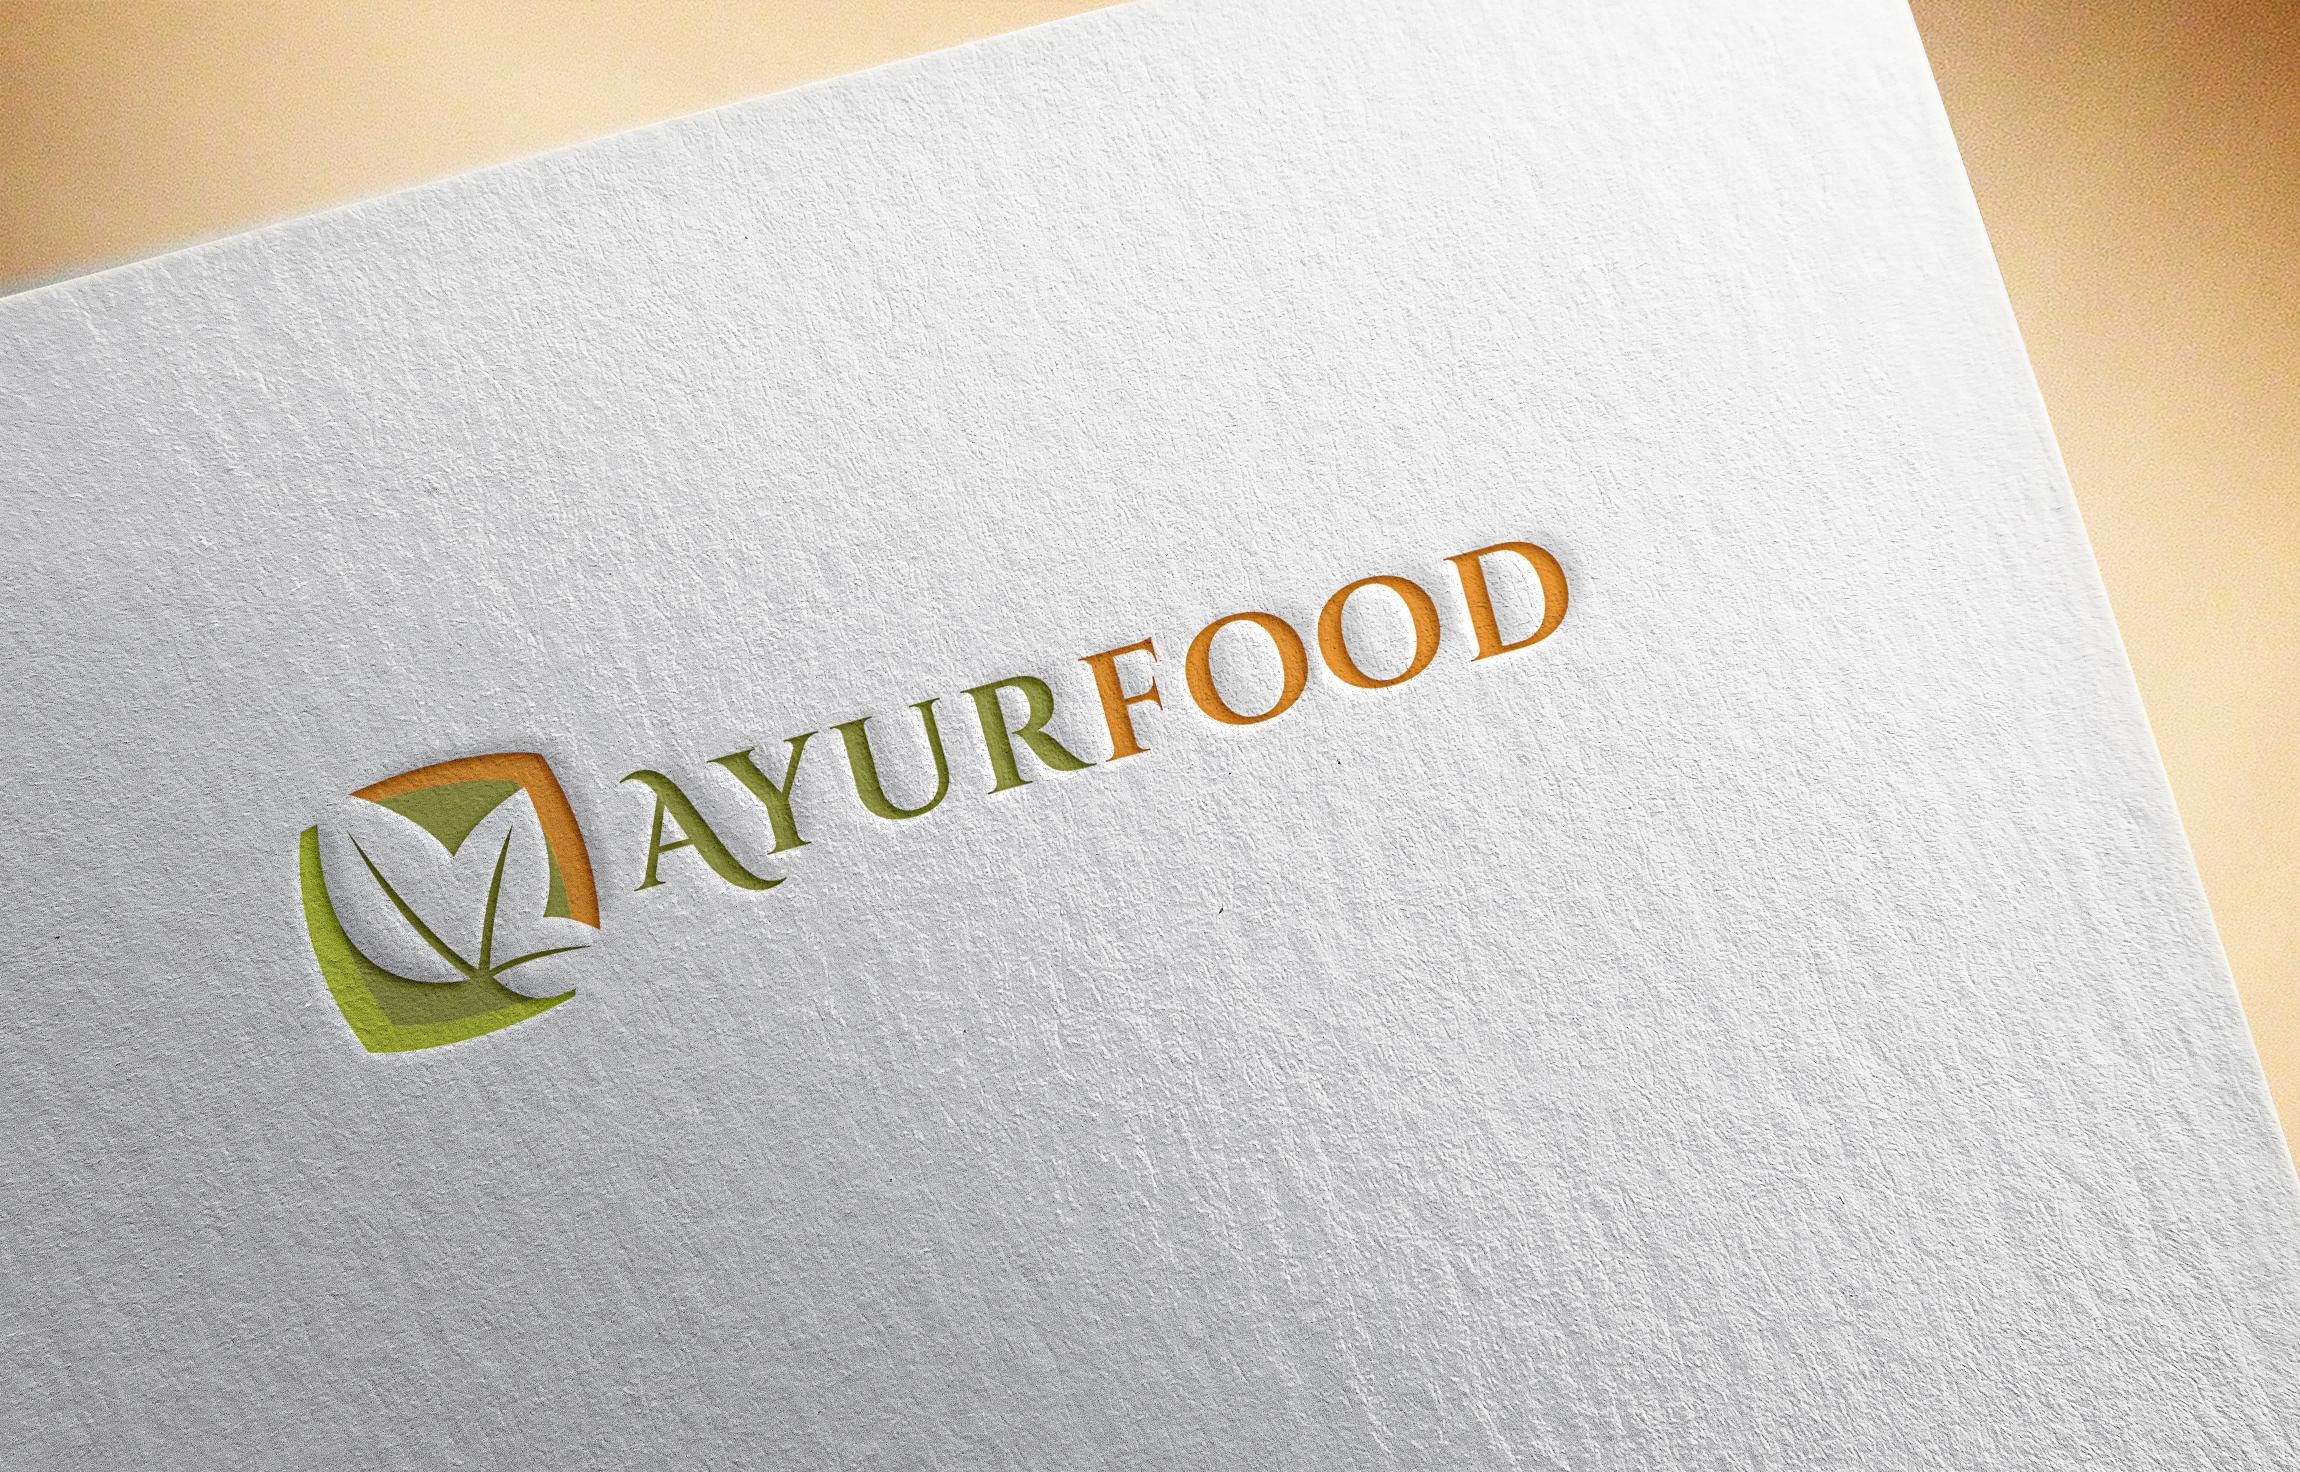 Ayurfood